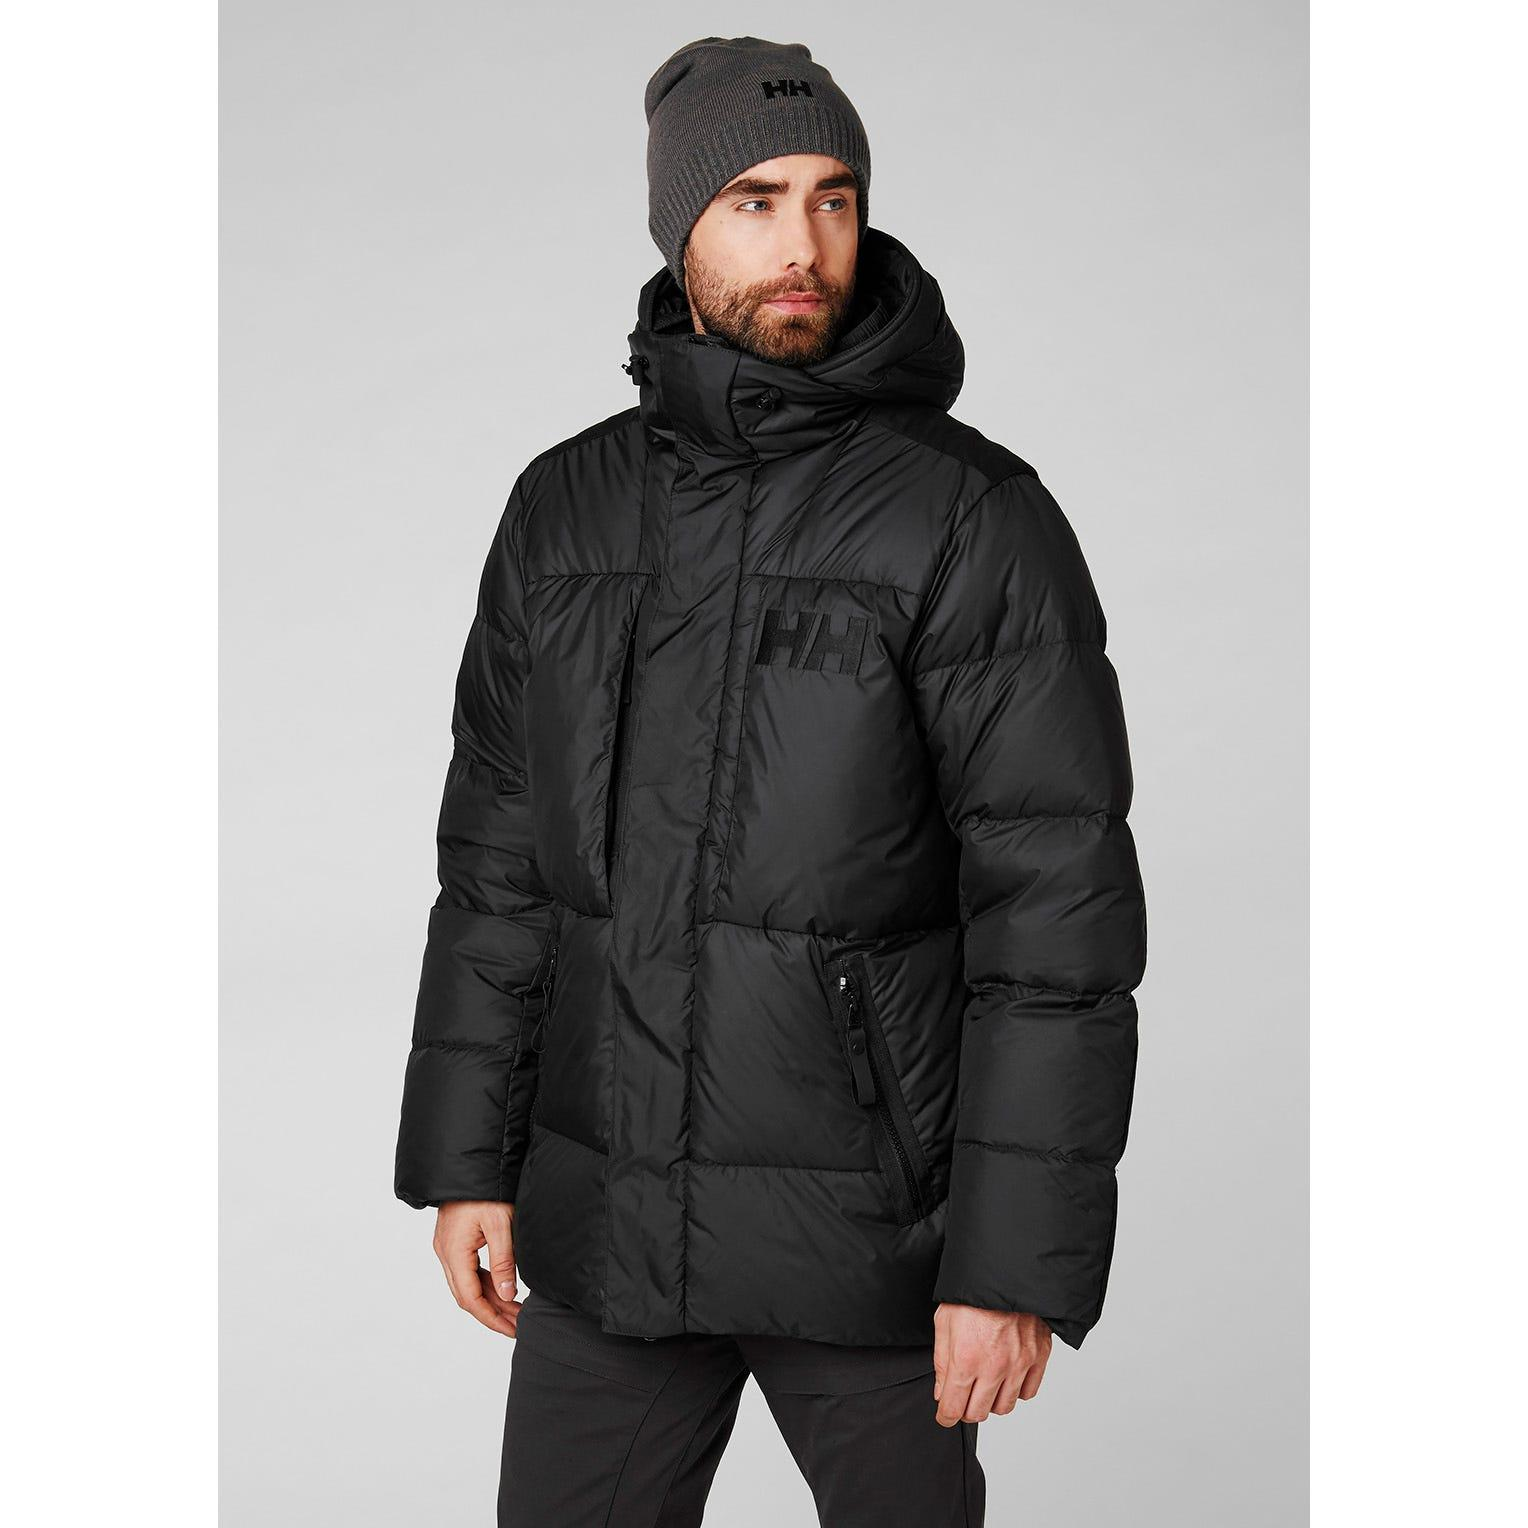 Helly Hansen Mens Arctic Patrol Down Parka Track Jacket